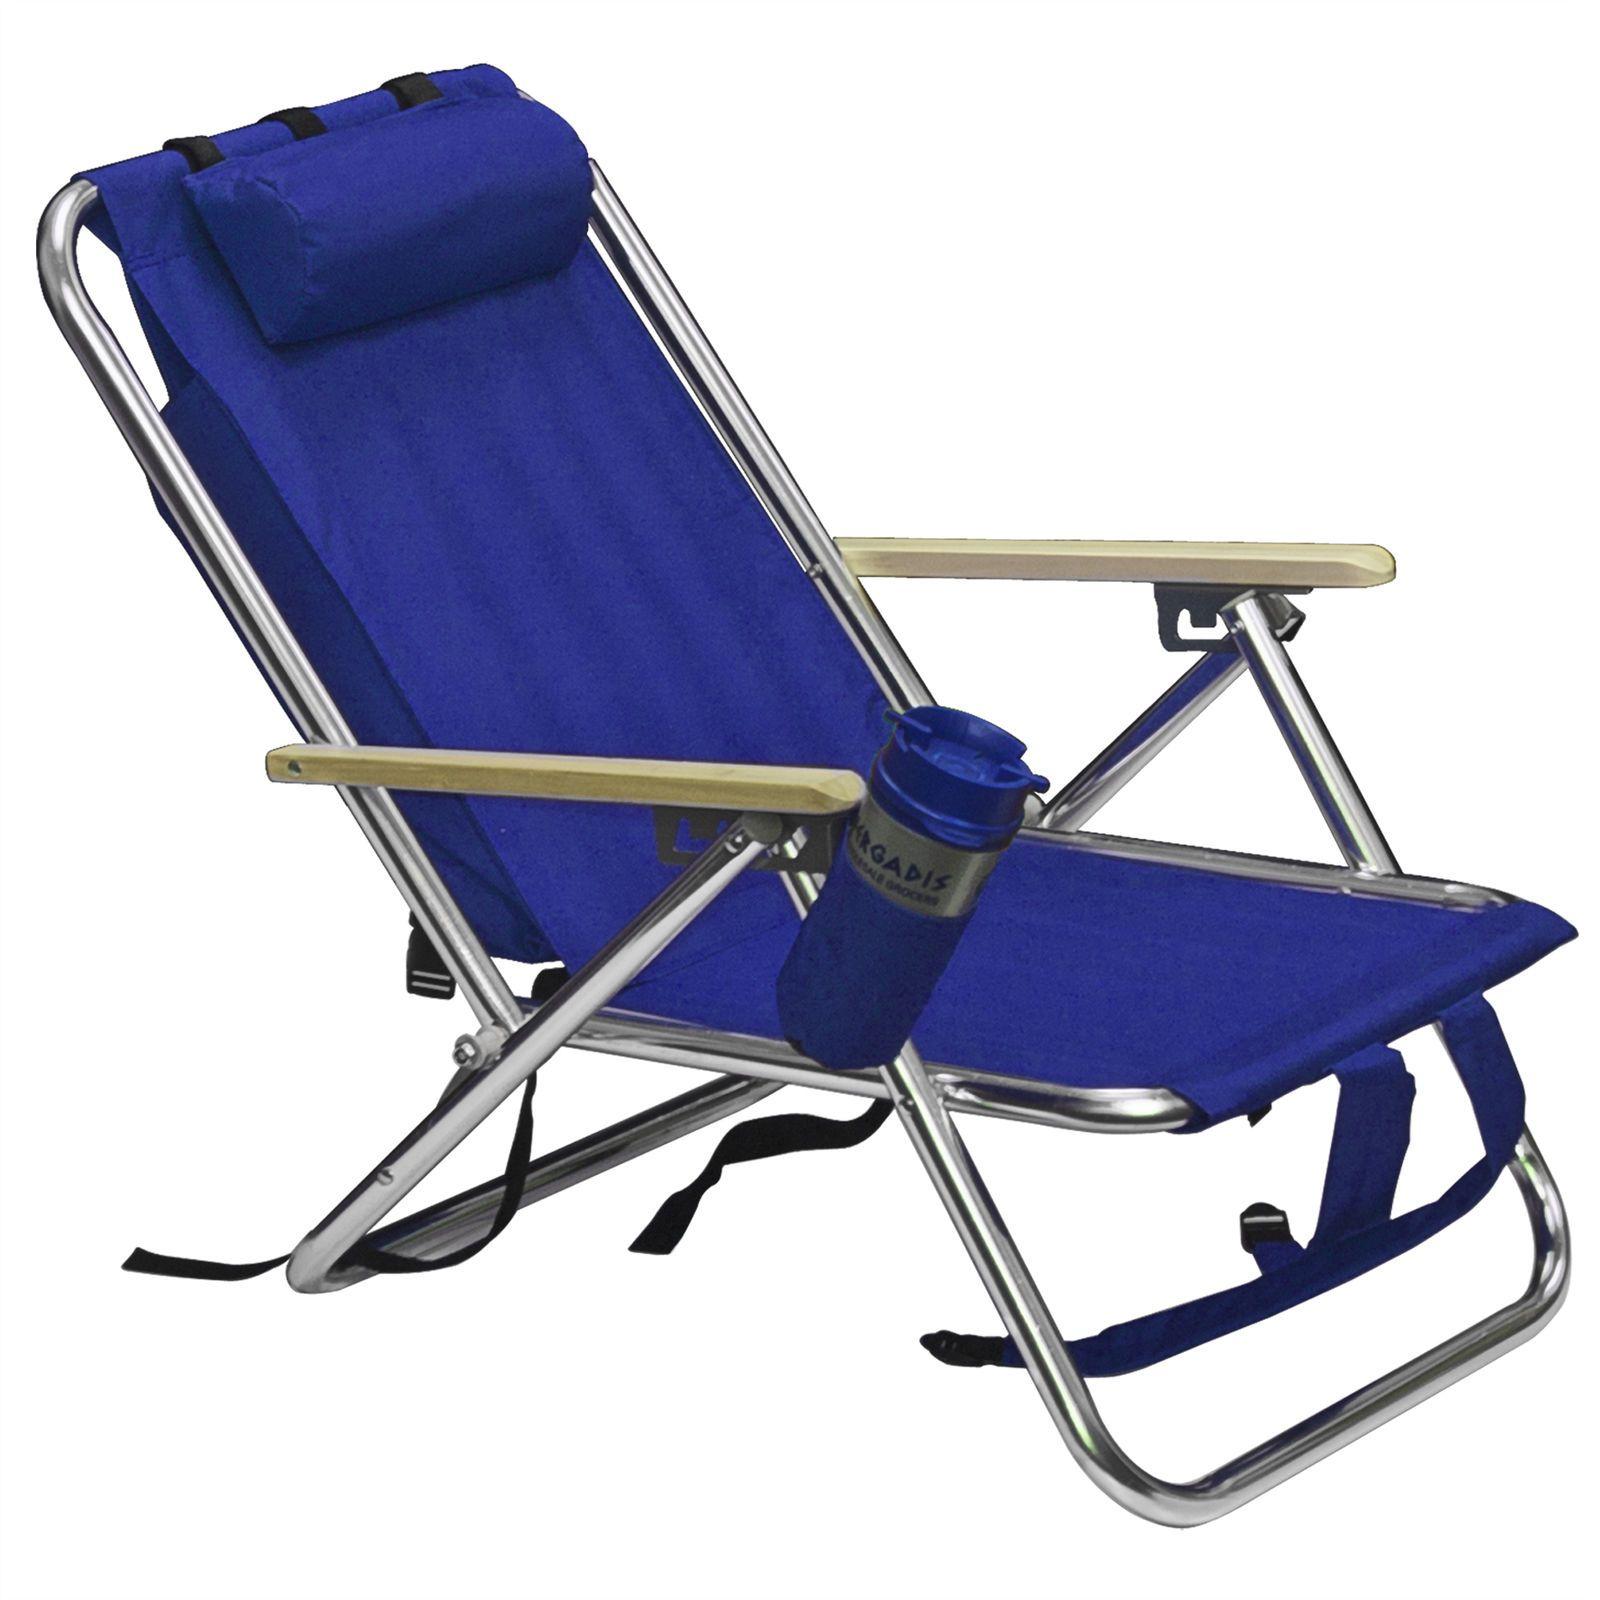 Chaise À Construction Plage New Blue Pliante Sac Dos Solide De Portable Camping b76vYgyfmI